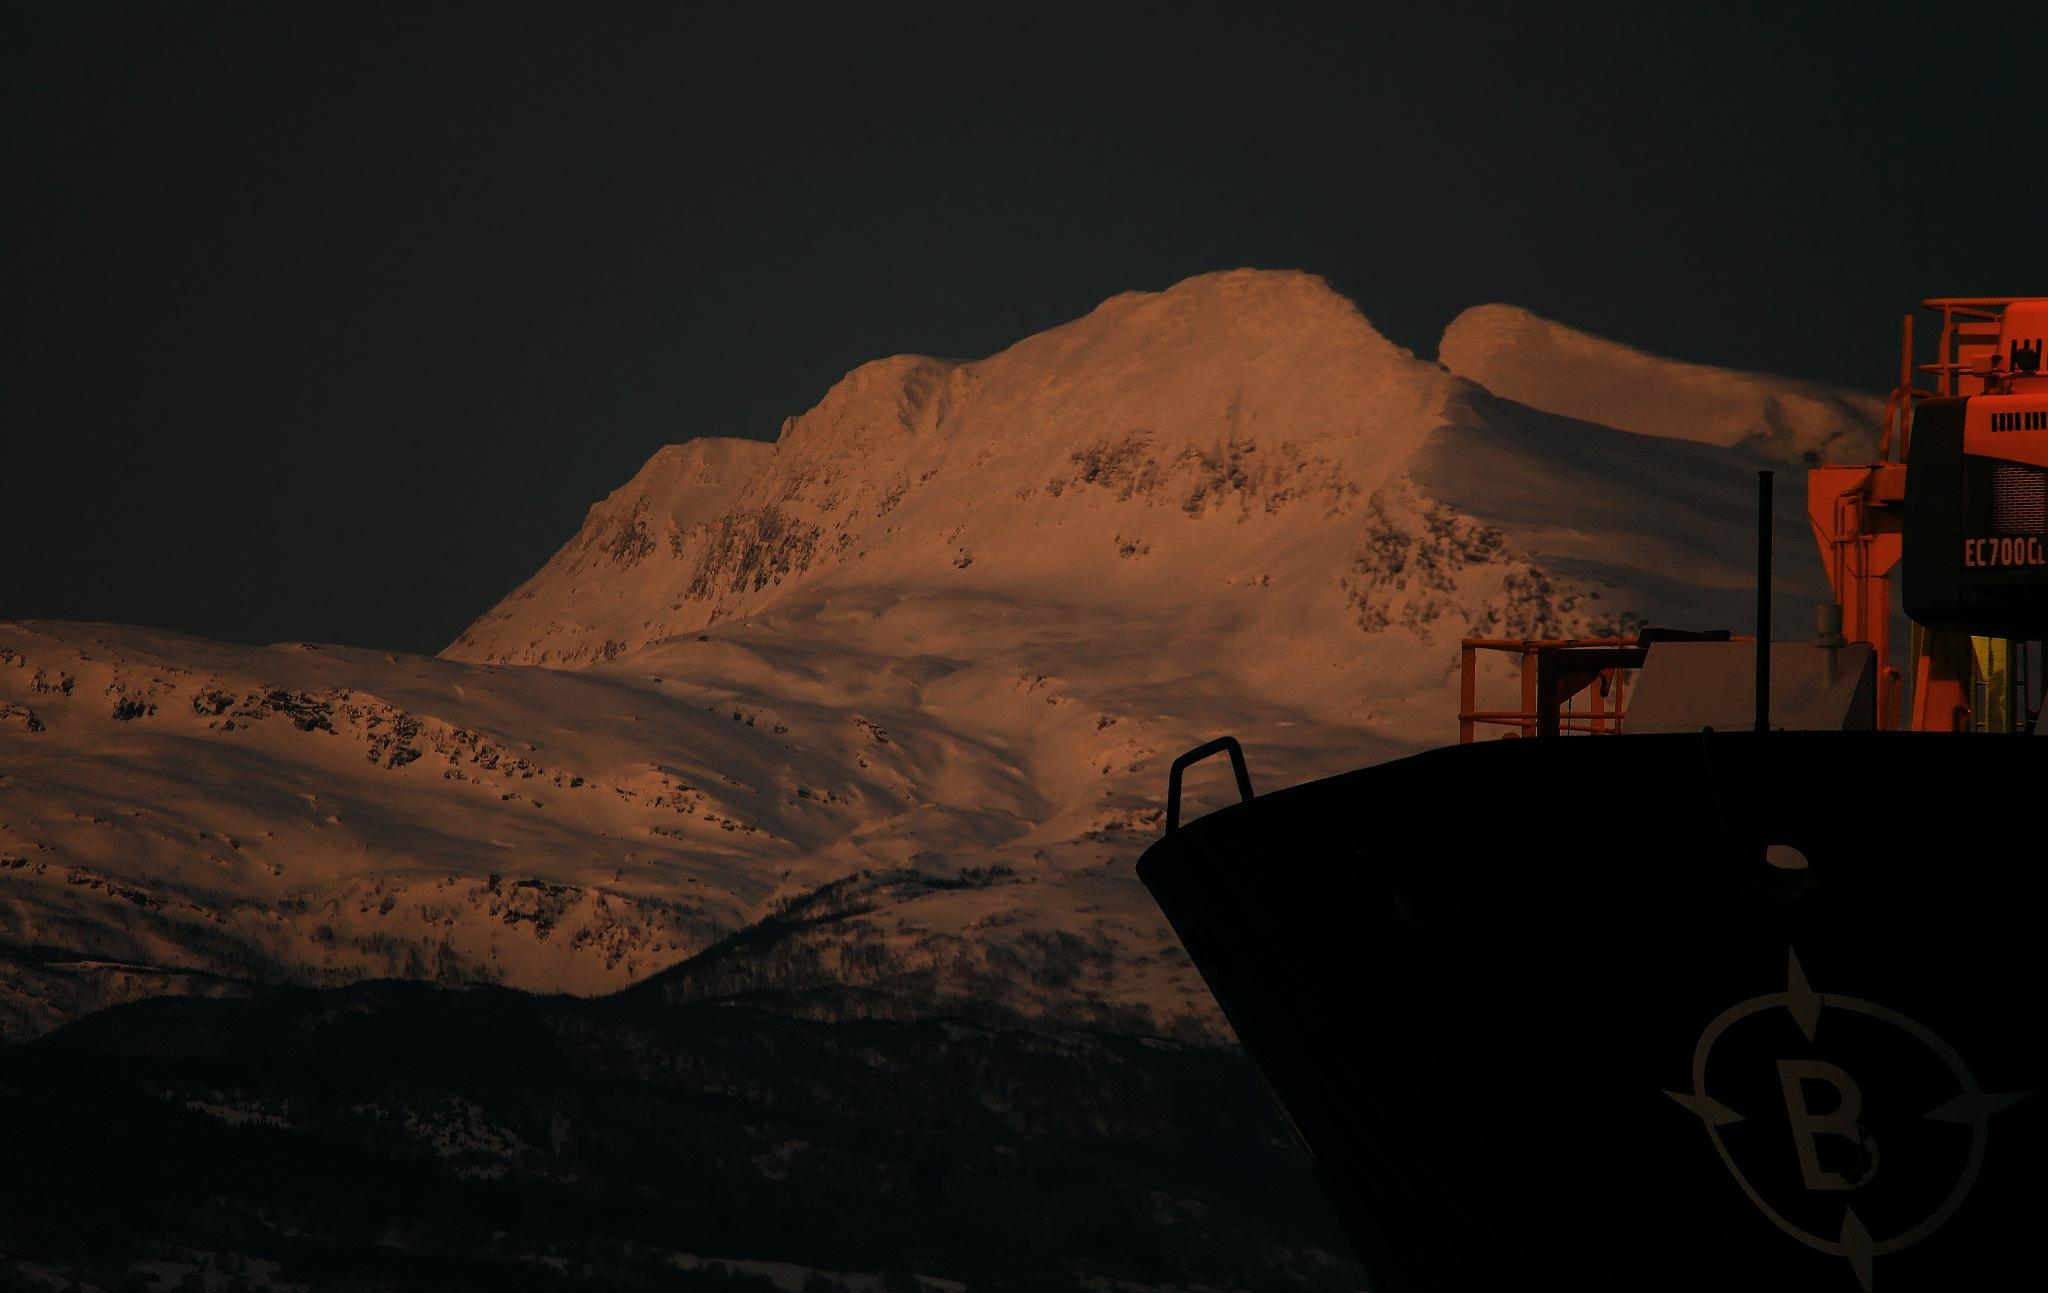 At dock's bay by John Frost-bite Slettjord